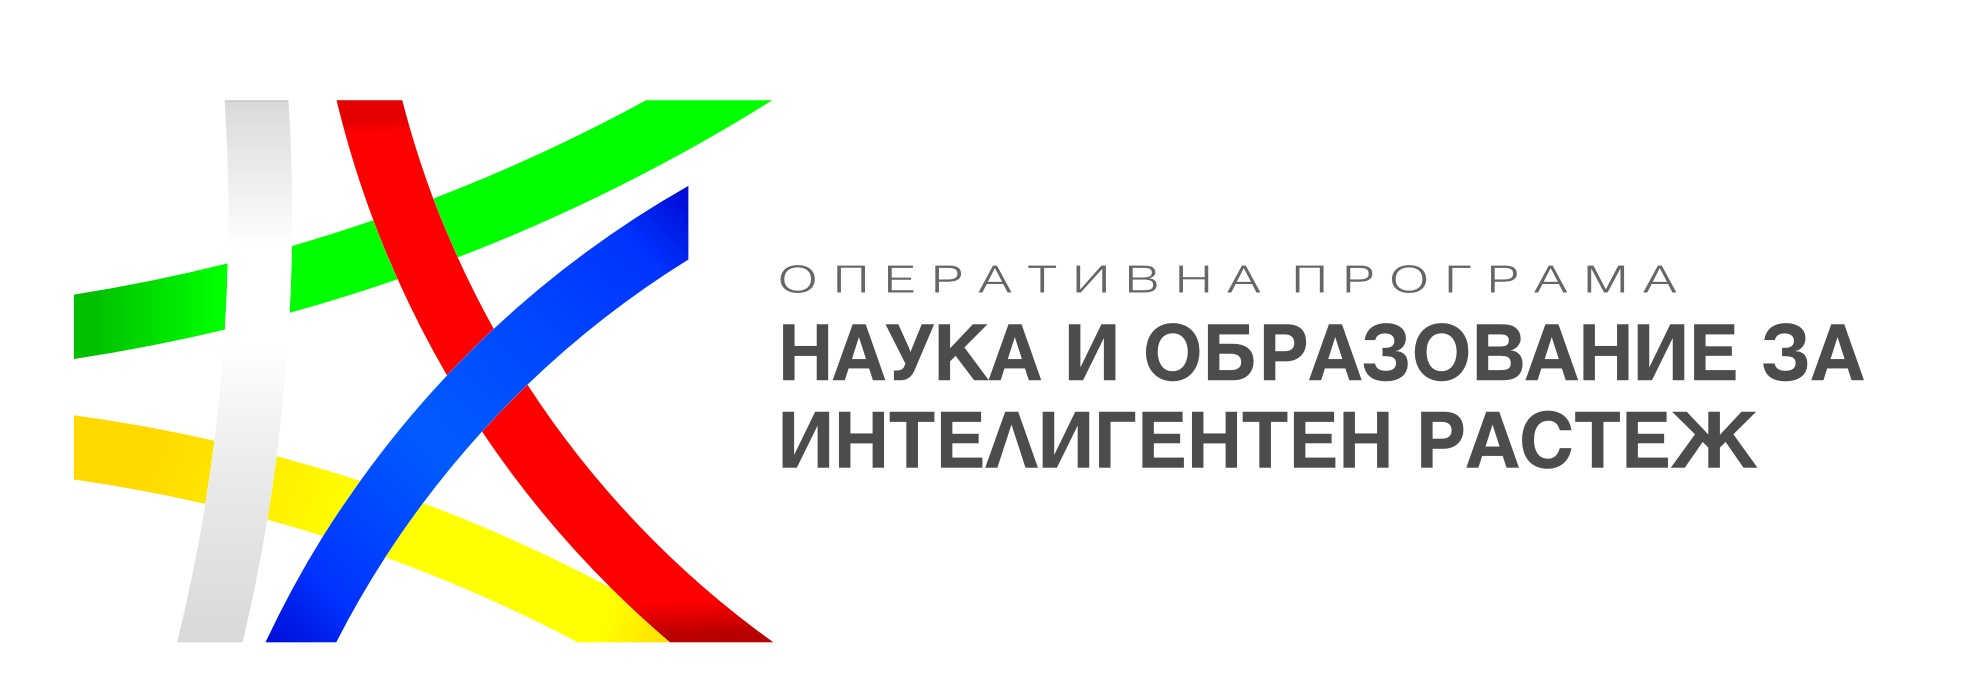 logo bg right